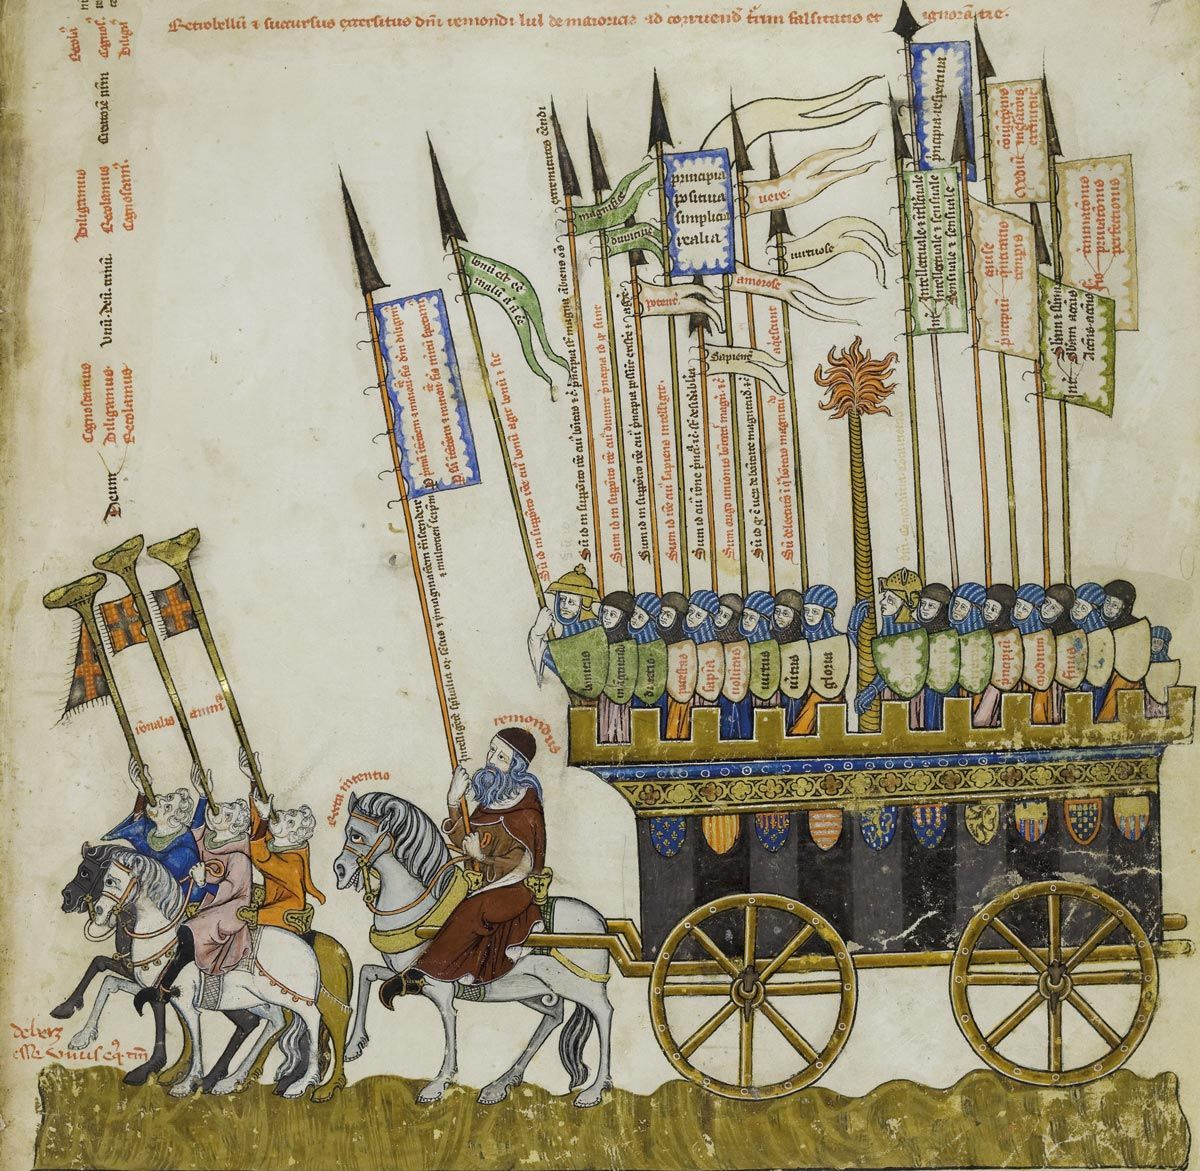 Aristóteles, Averroes y Llull, en defensa de la verdad, Tomas Le Myésier, Breviculum ex artibus Raimundi Lulli electum, h. 1321, Karlsruhe, Badische Landesbibliothek, Cod. St. Peter, perg. 92.